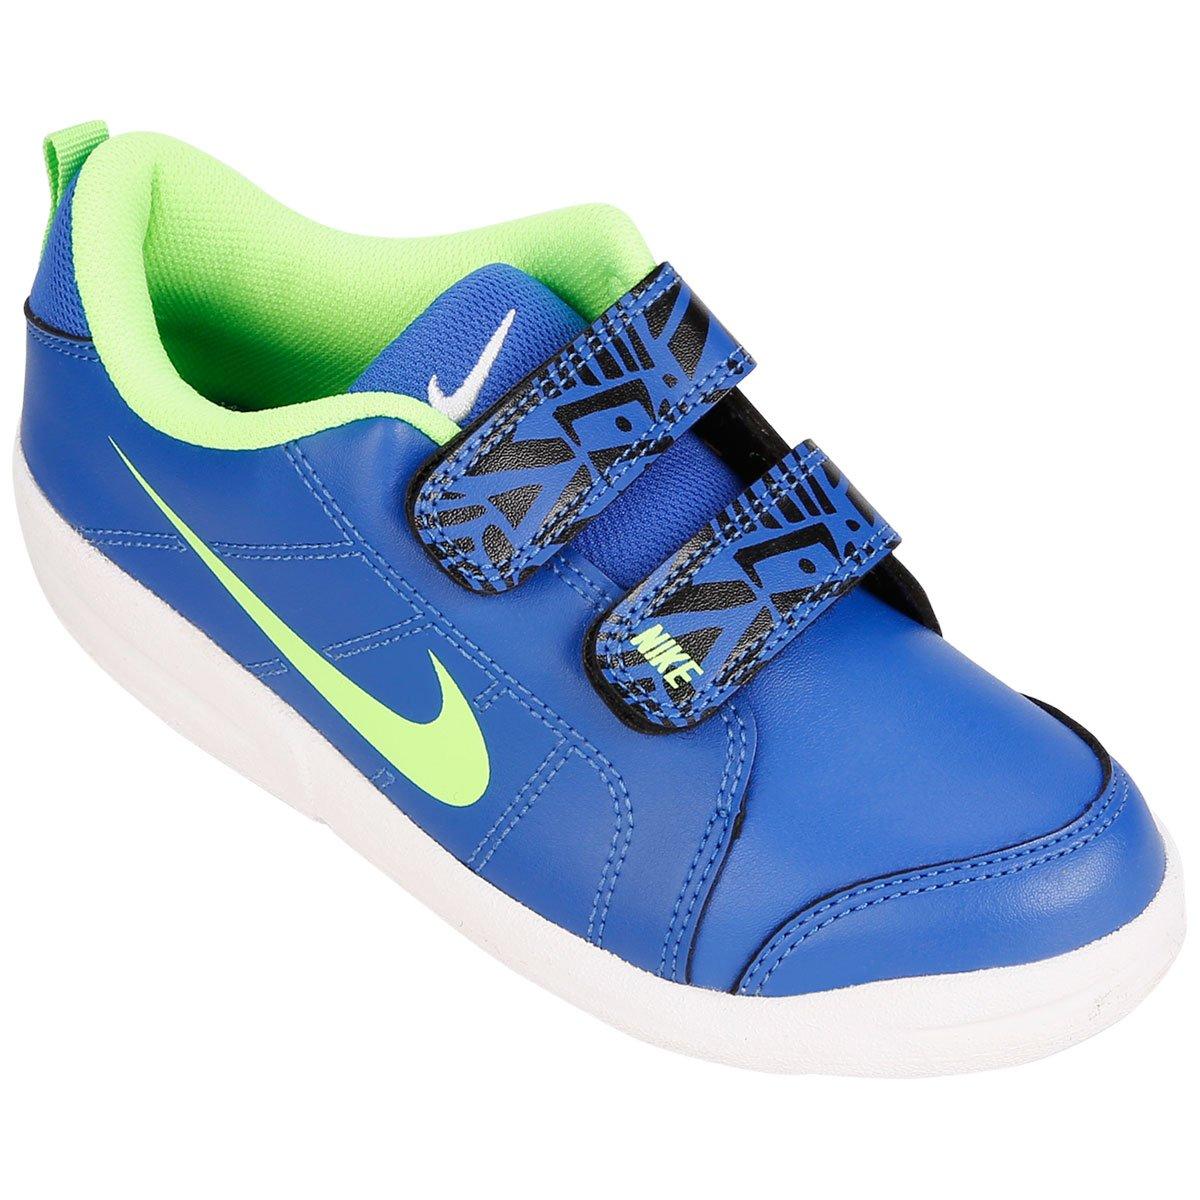 bb6c6847593 Tênis Infantil Nike Pico Lt - Azul Royal - Compre Agora